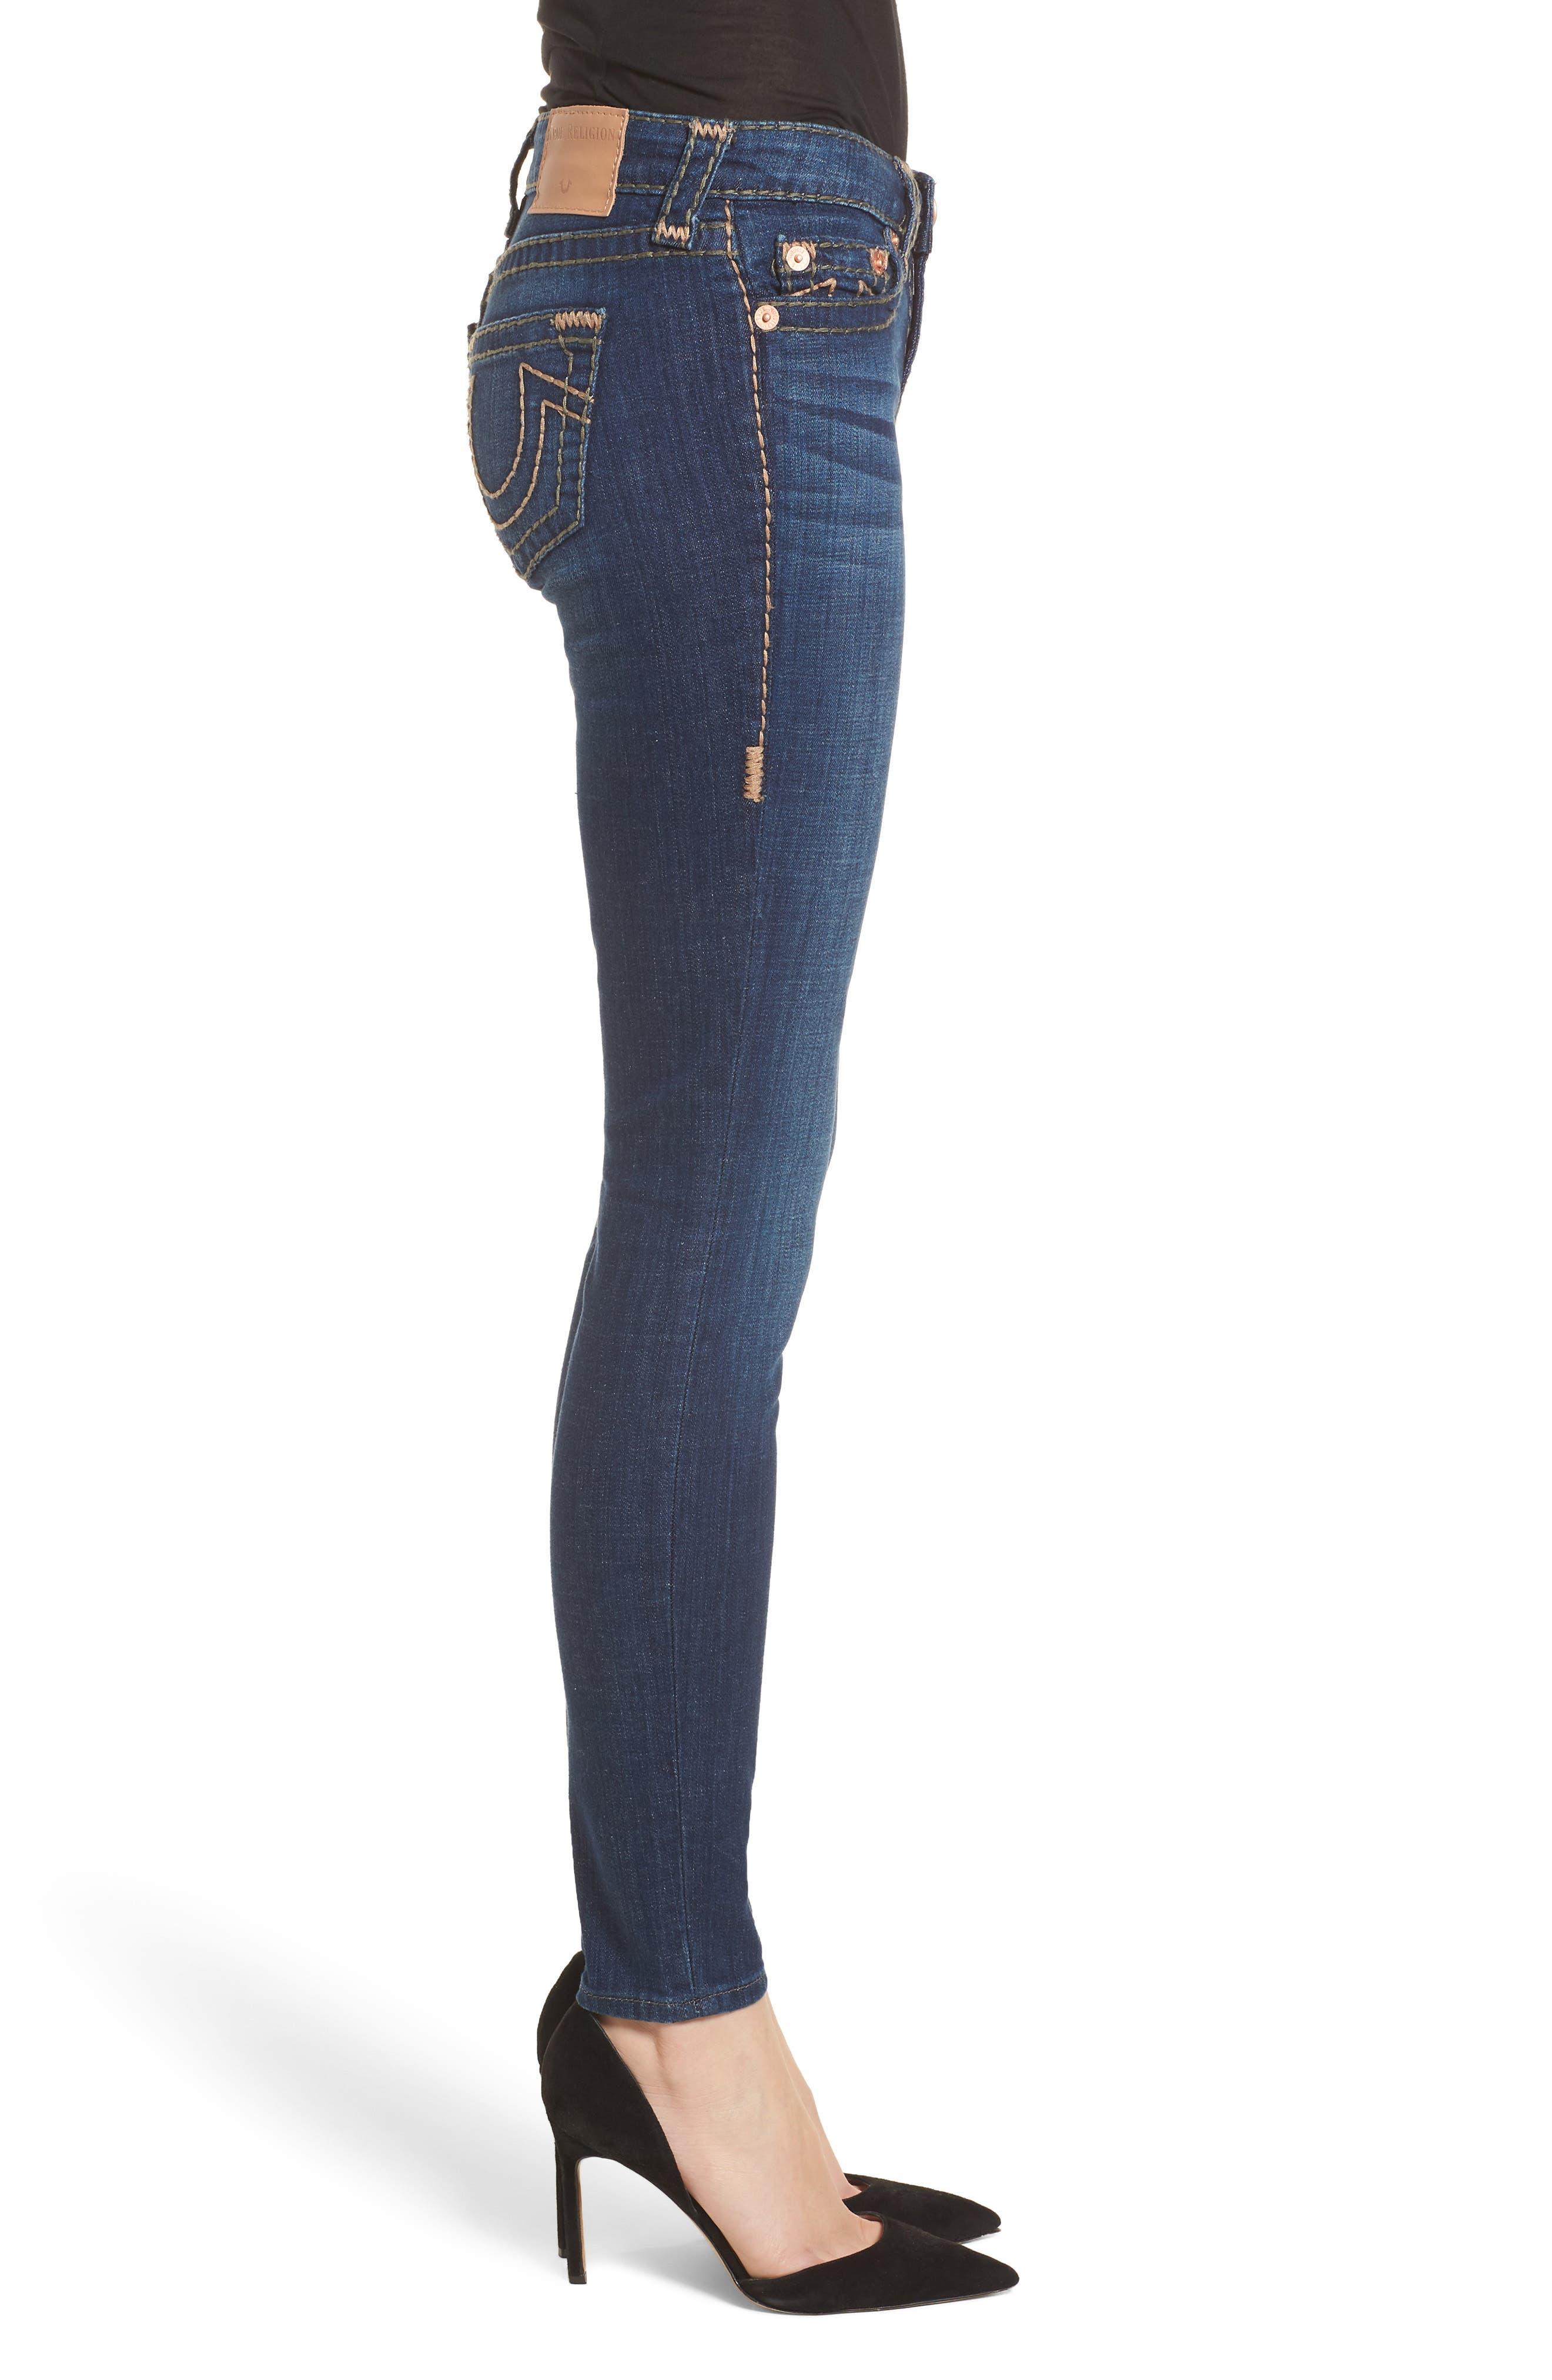 Halle Skinny Jeans,                             Alternate thumbnail 3, color,                             402